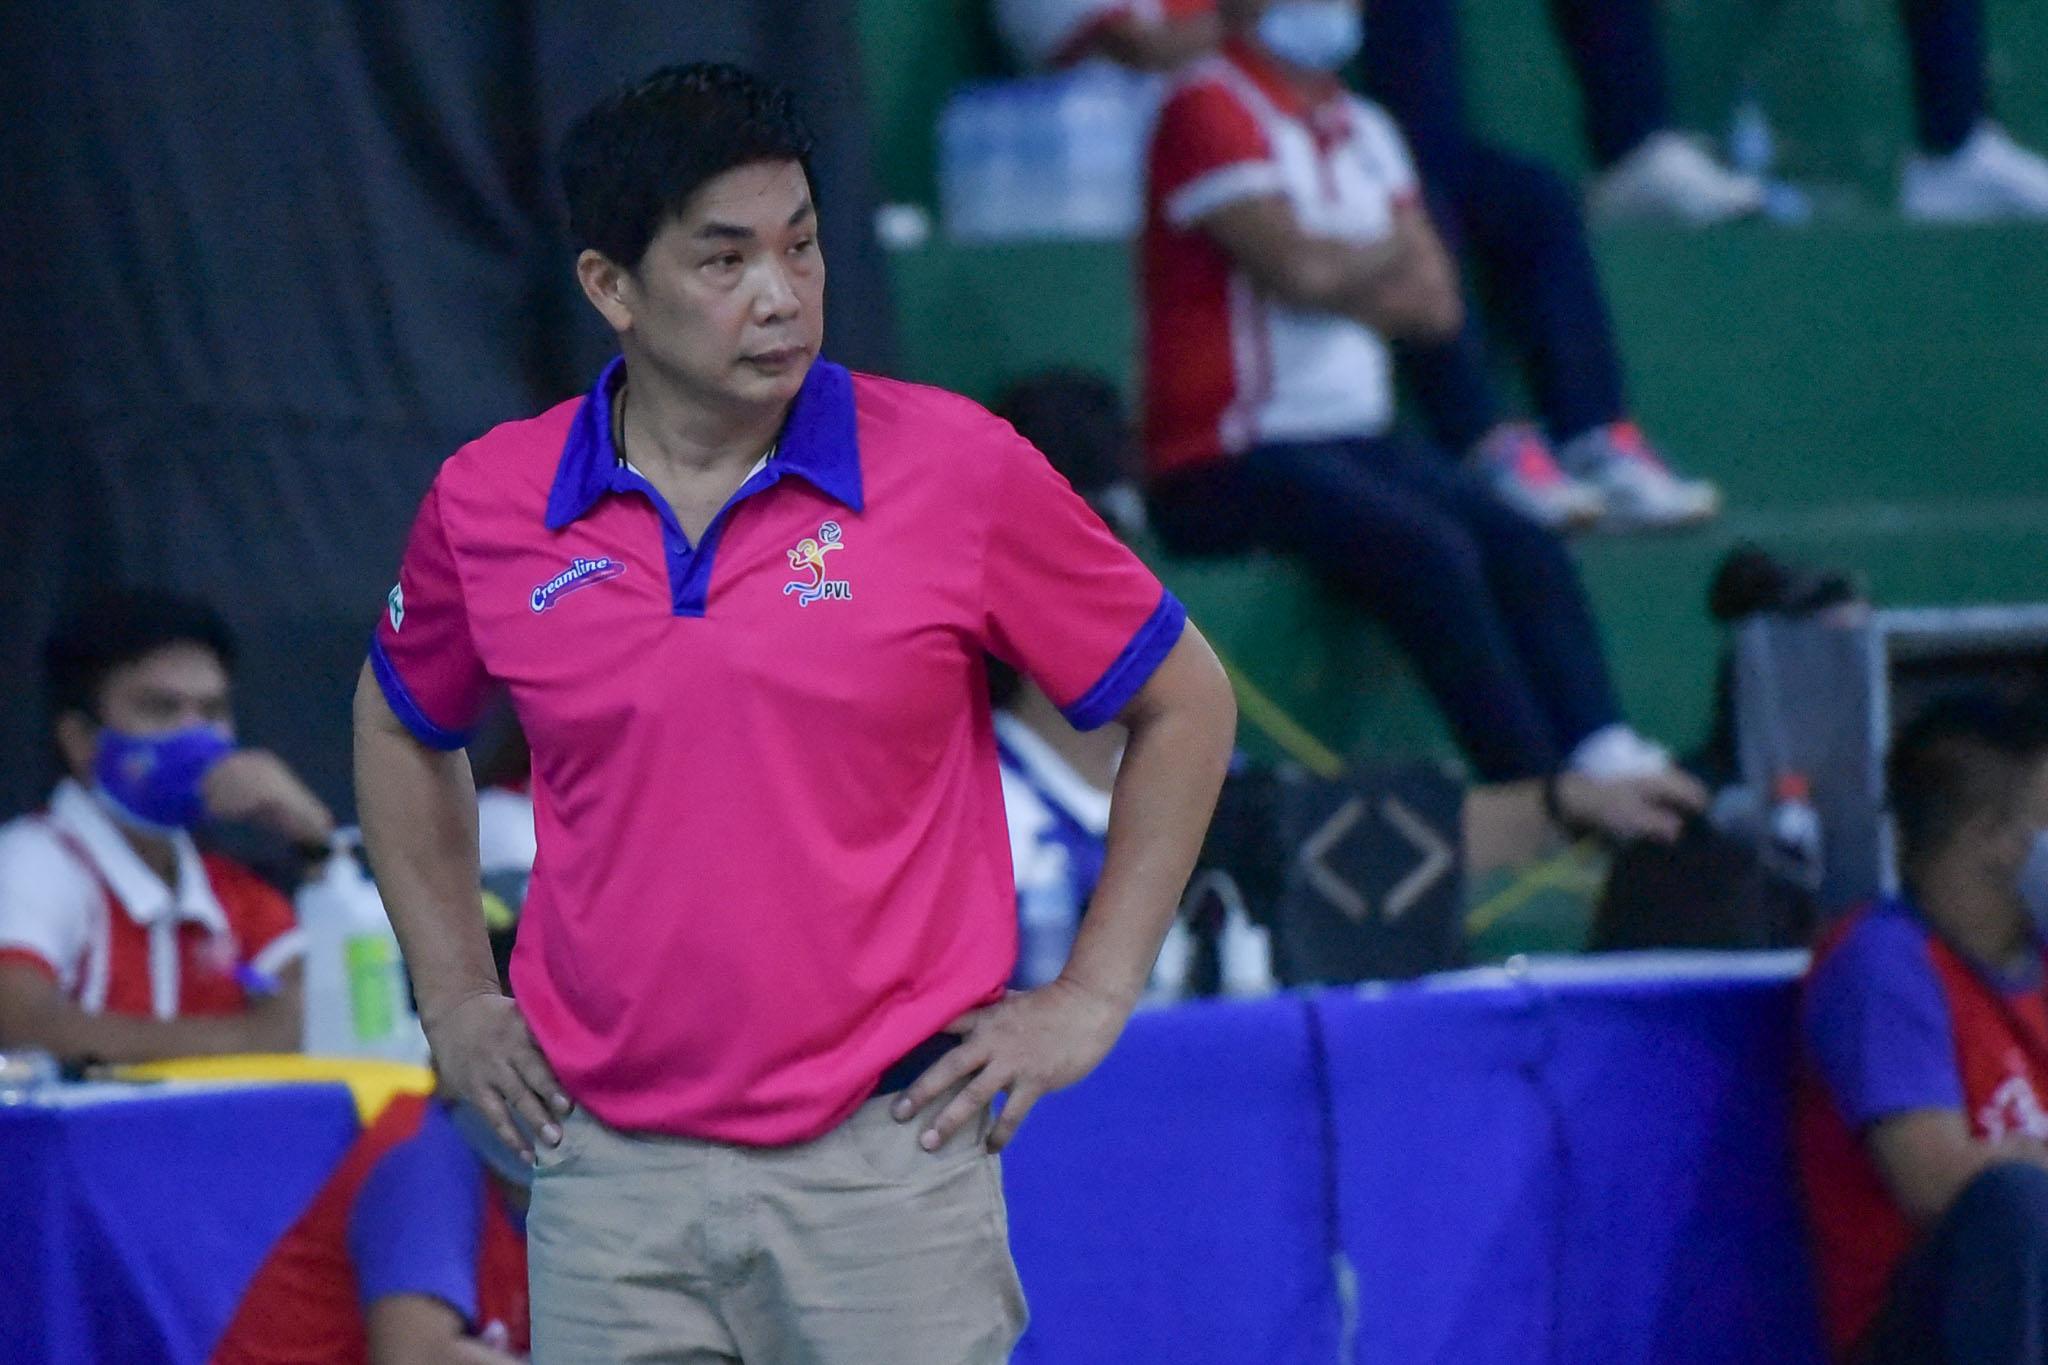 2021-PVL-Open-Creamline-vs.-Choco-Mucho-Tai-Bundit-7732 Tots Carlos relishes being on same side with Tai Bundit News PVL Volleyball  - philippine sports news